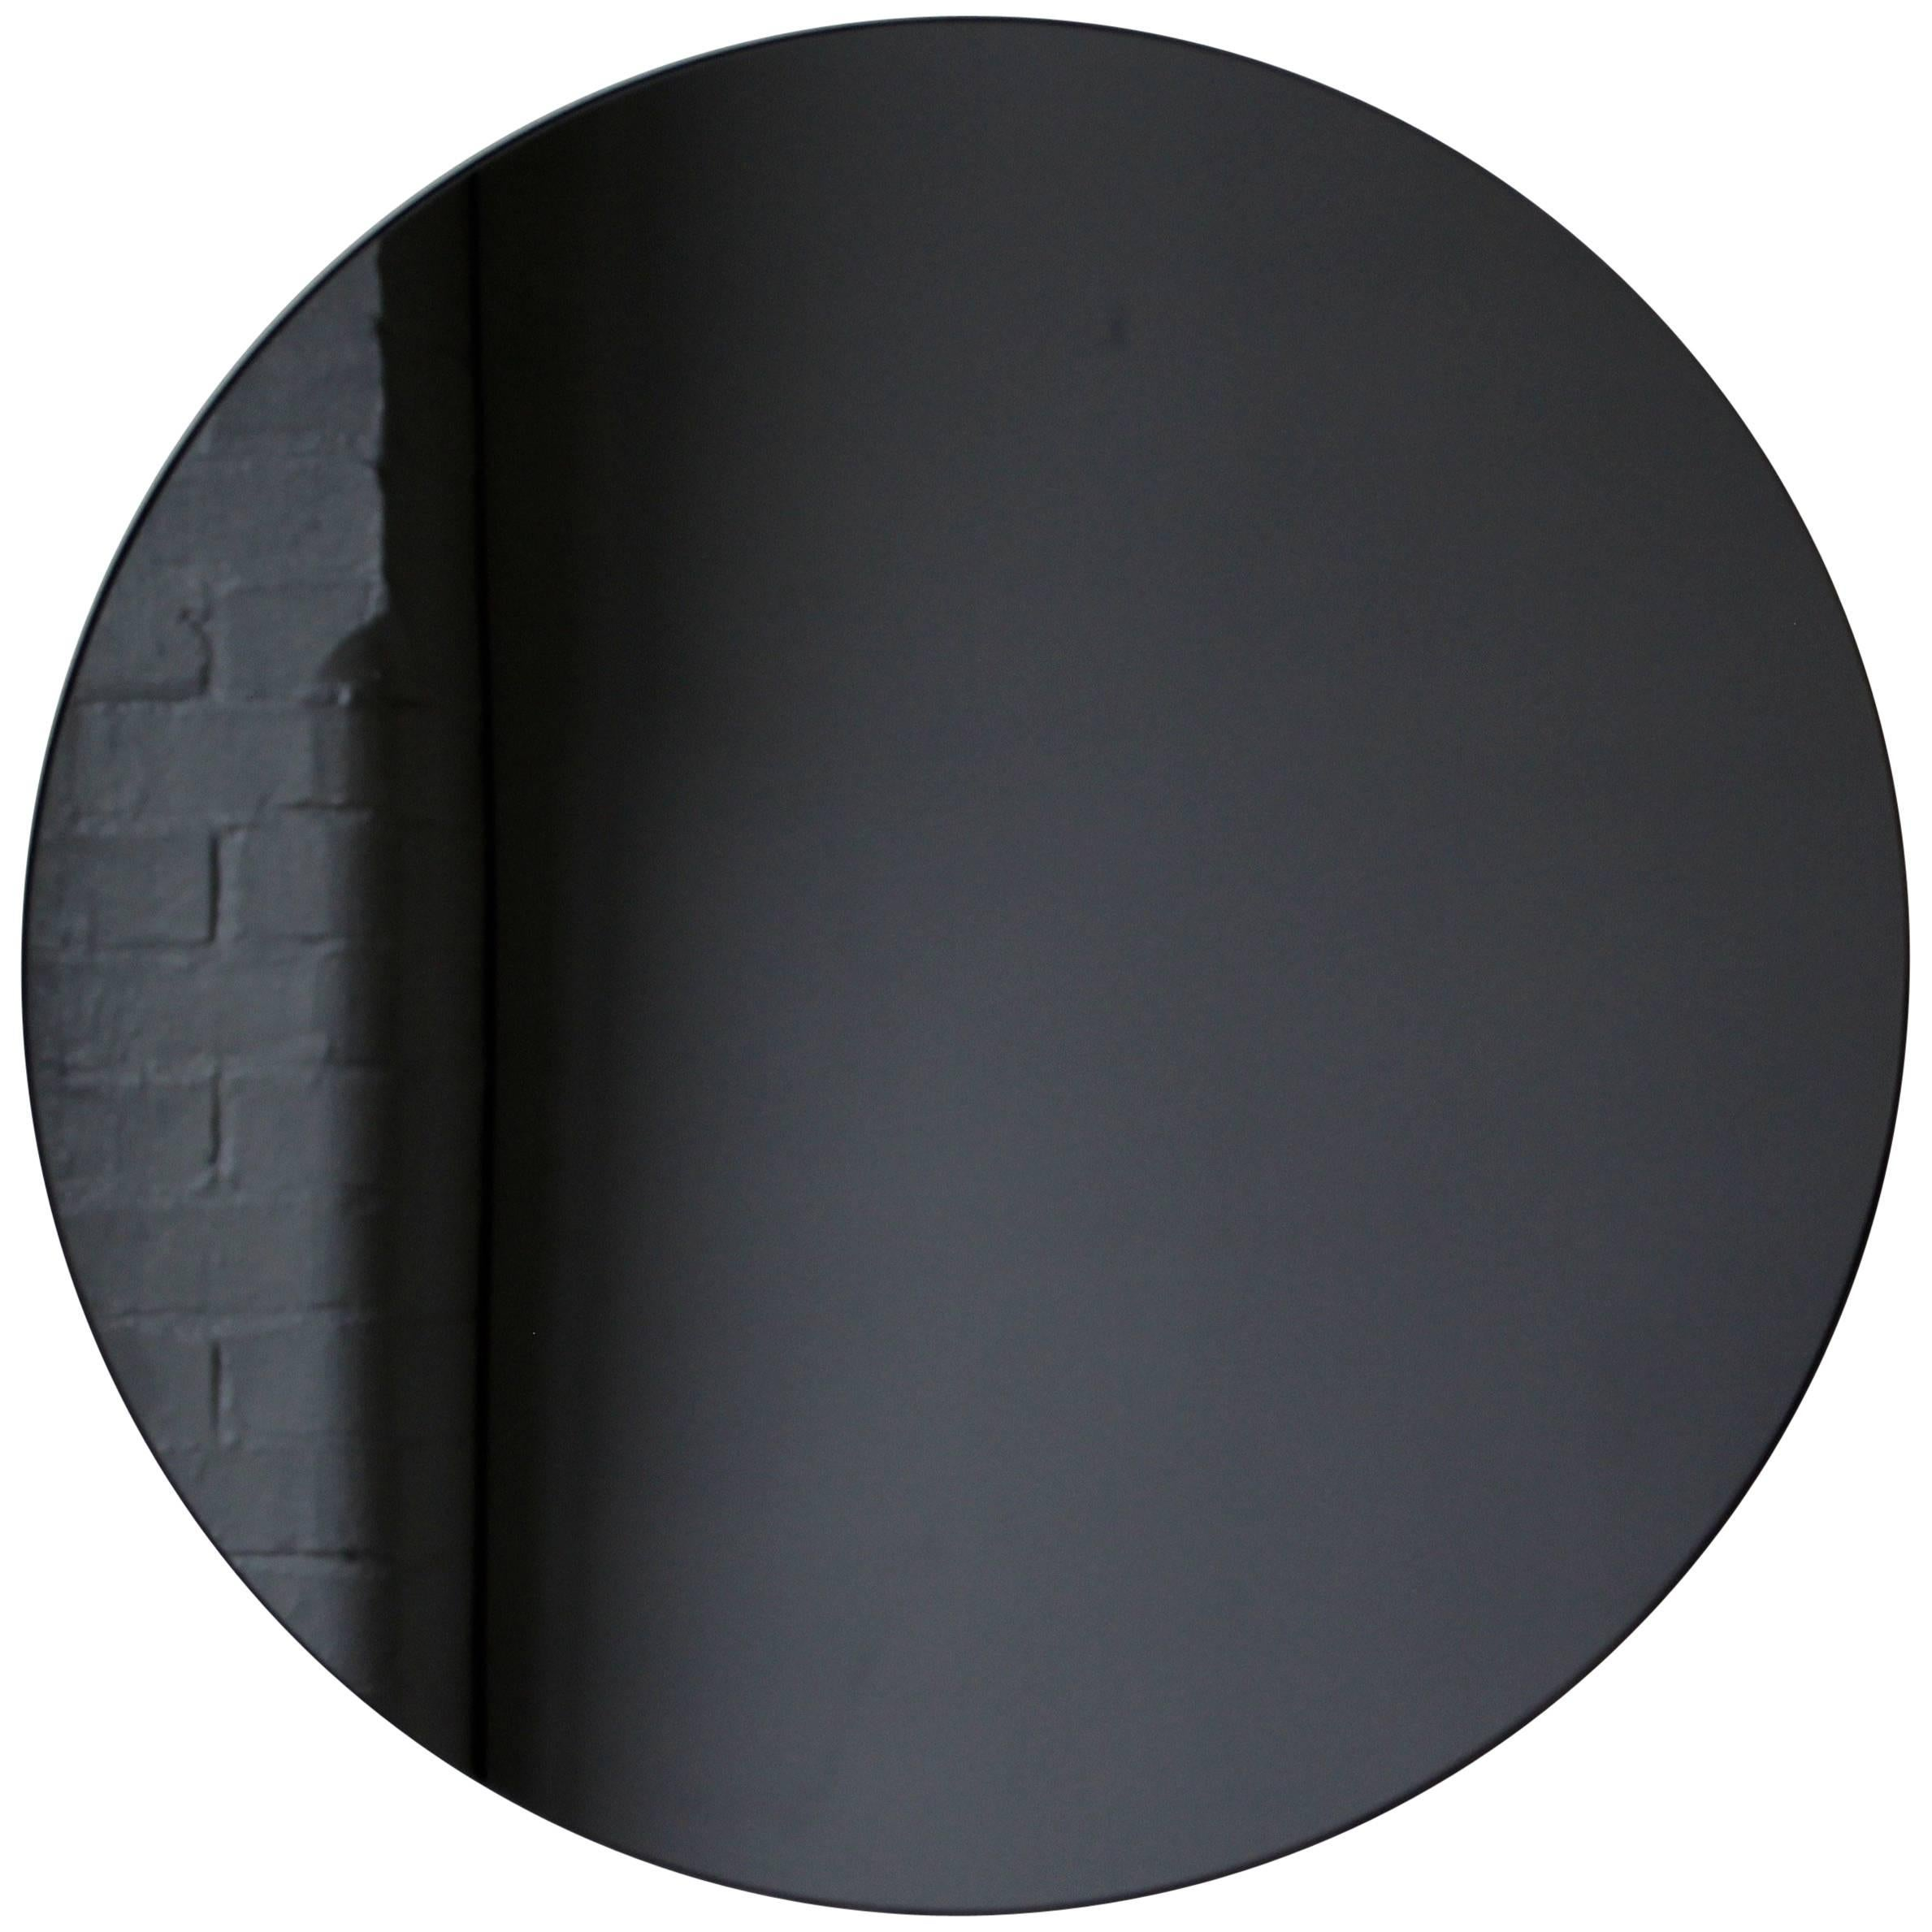 Orbis™ Black Tinted Round Frameless Contemporary Mirror - Regular